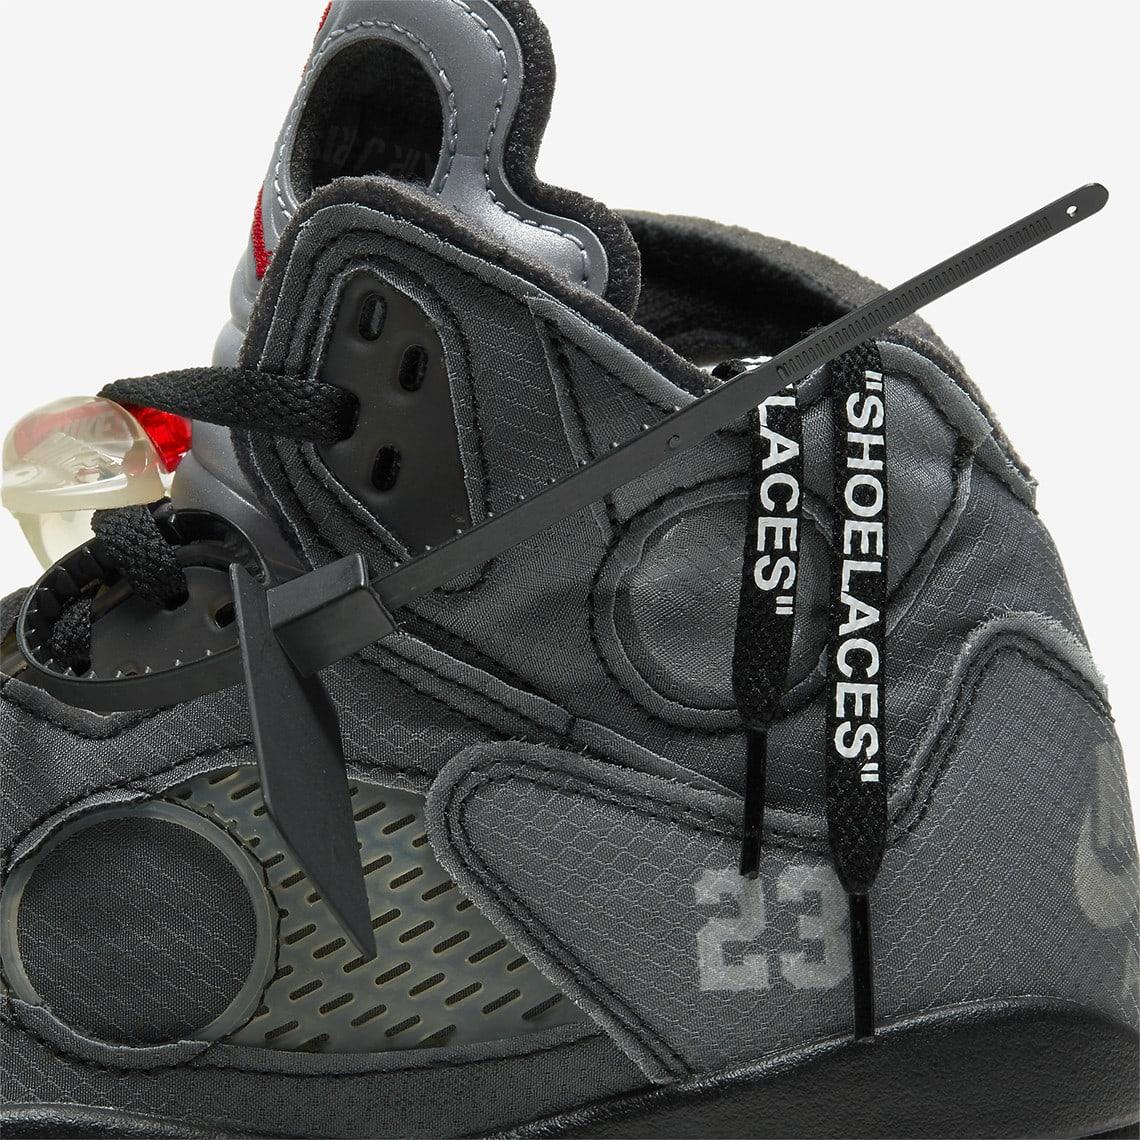 Off-White x Air Jordan 5 CT8480-001 (Detail)